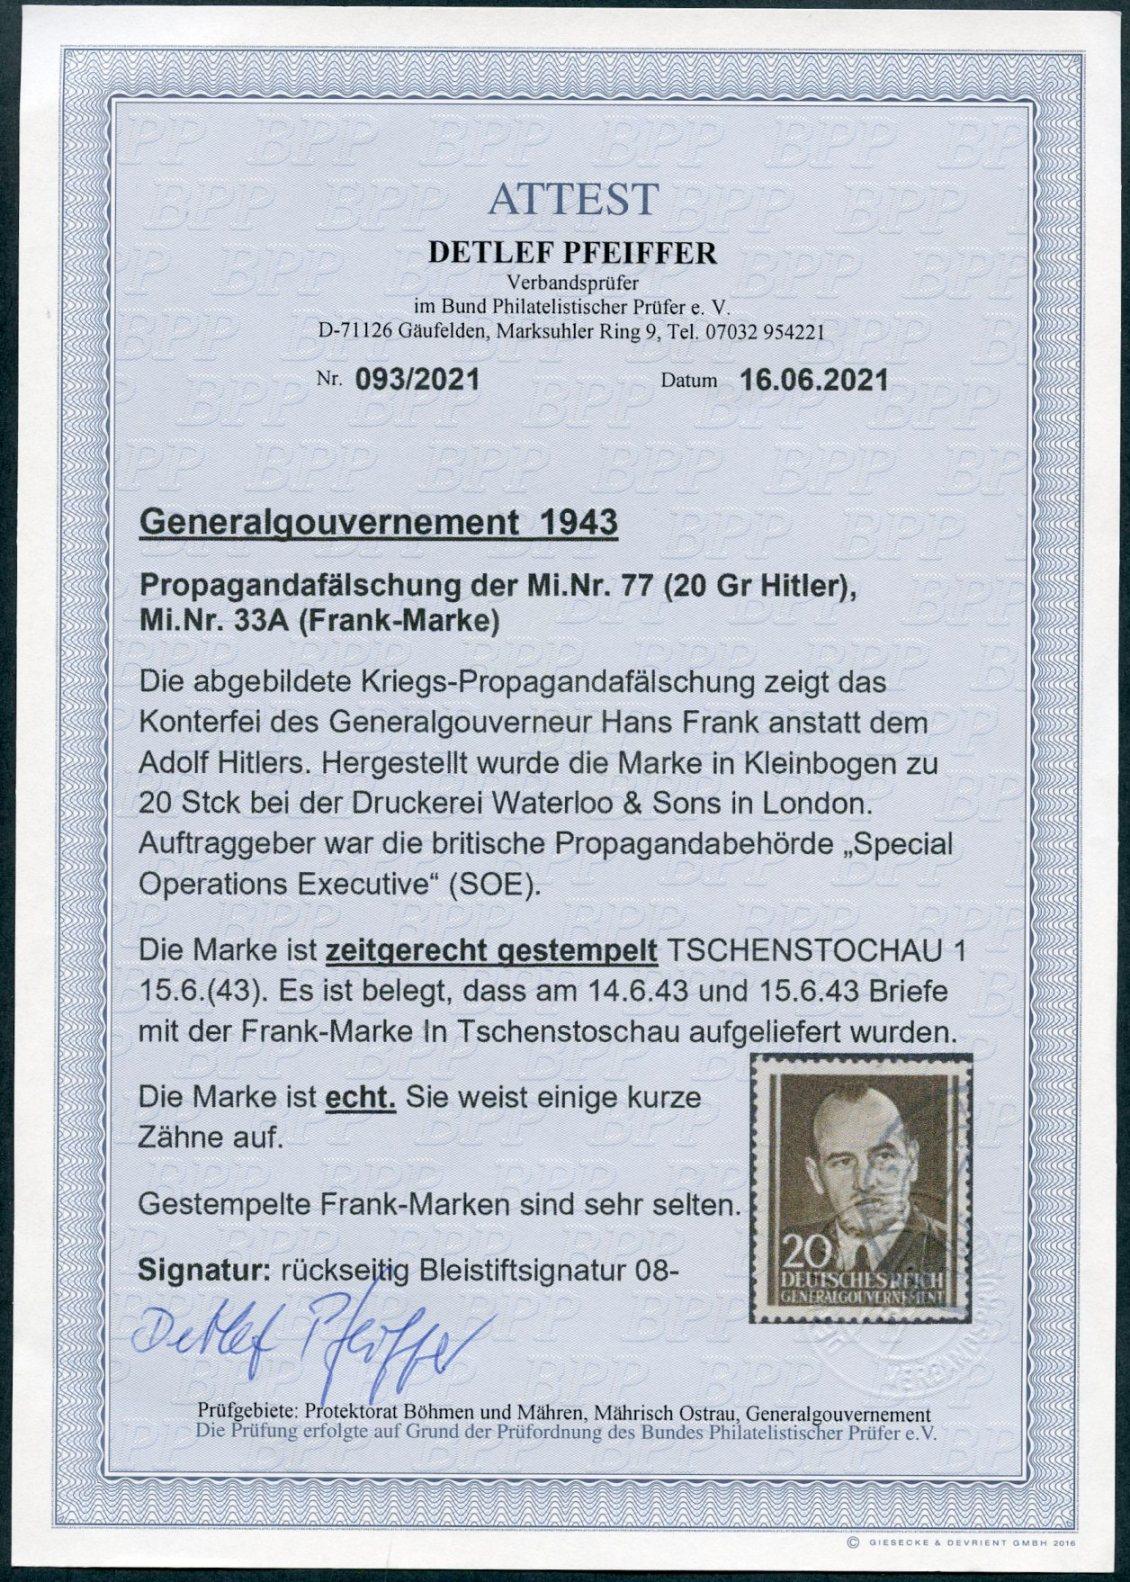 Lot 5 - germany  -  Tel Aviv Stamps Ltd. Auction #50